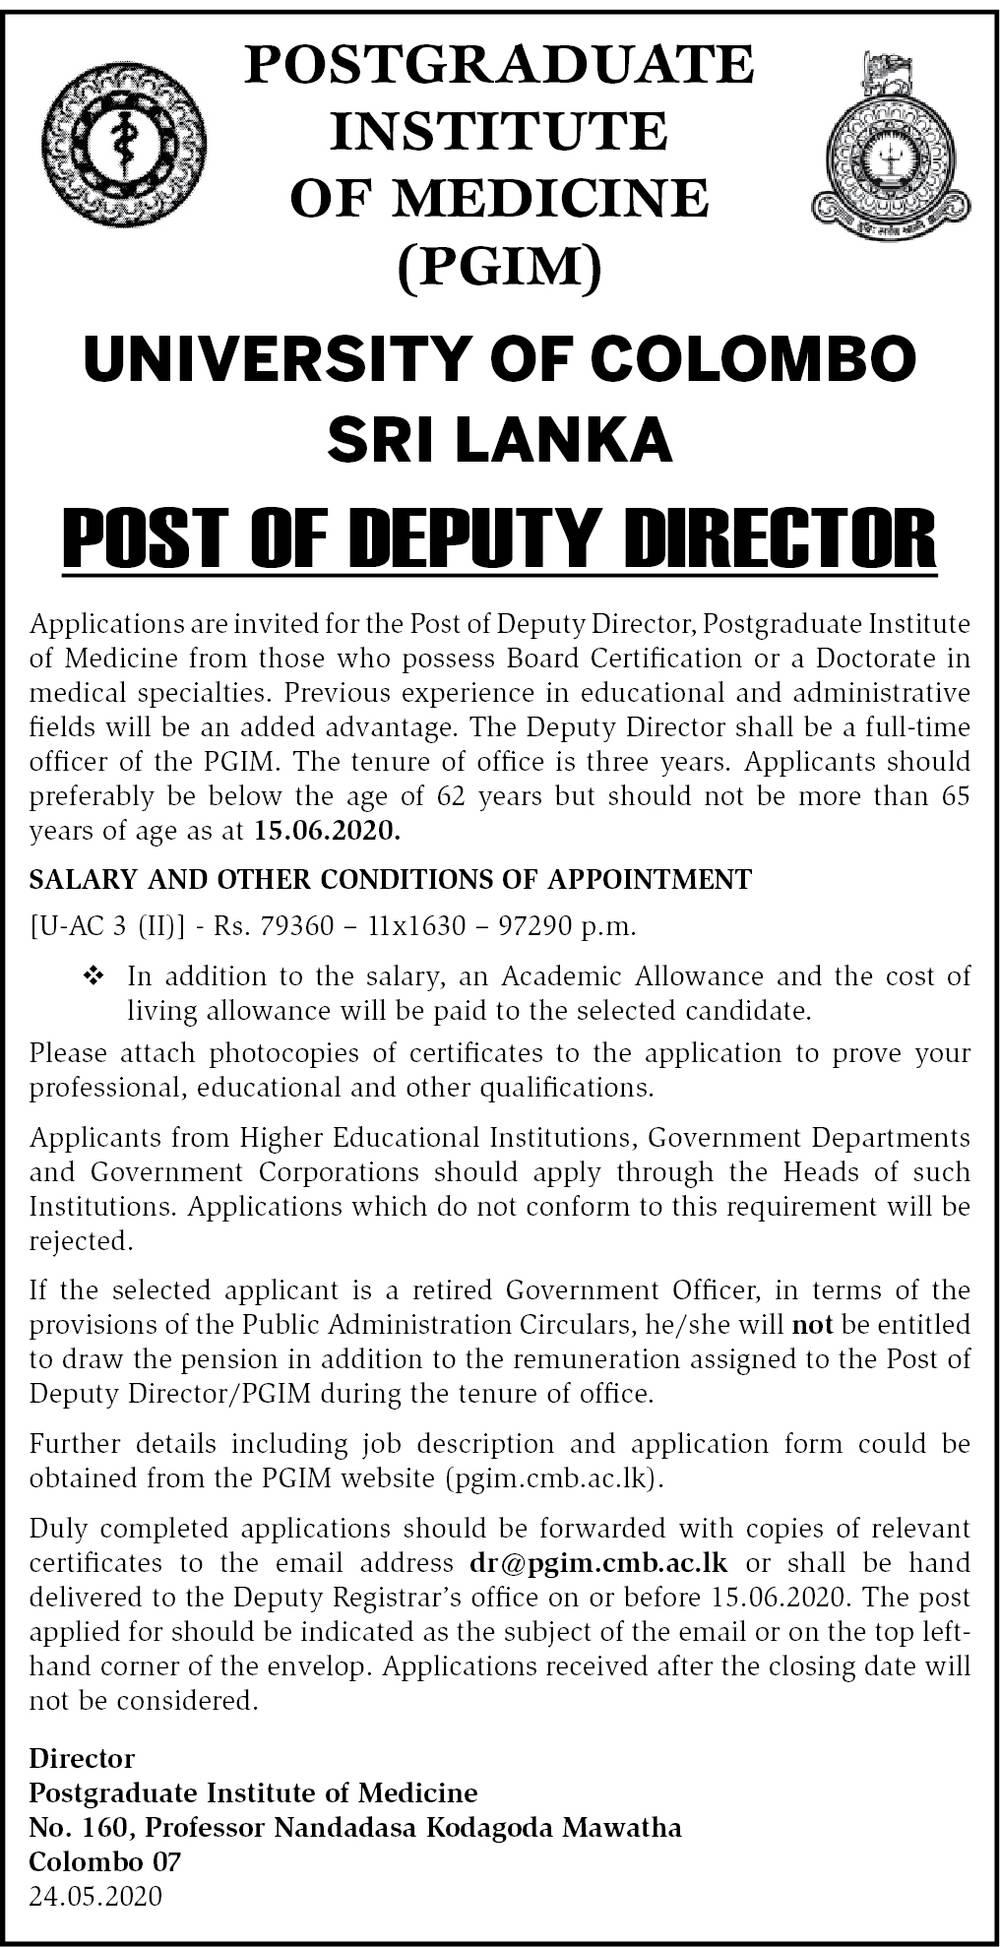 Deputy Director - Postgraduate Institute of Medicine - University of Colombo